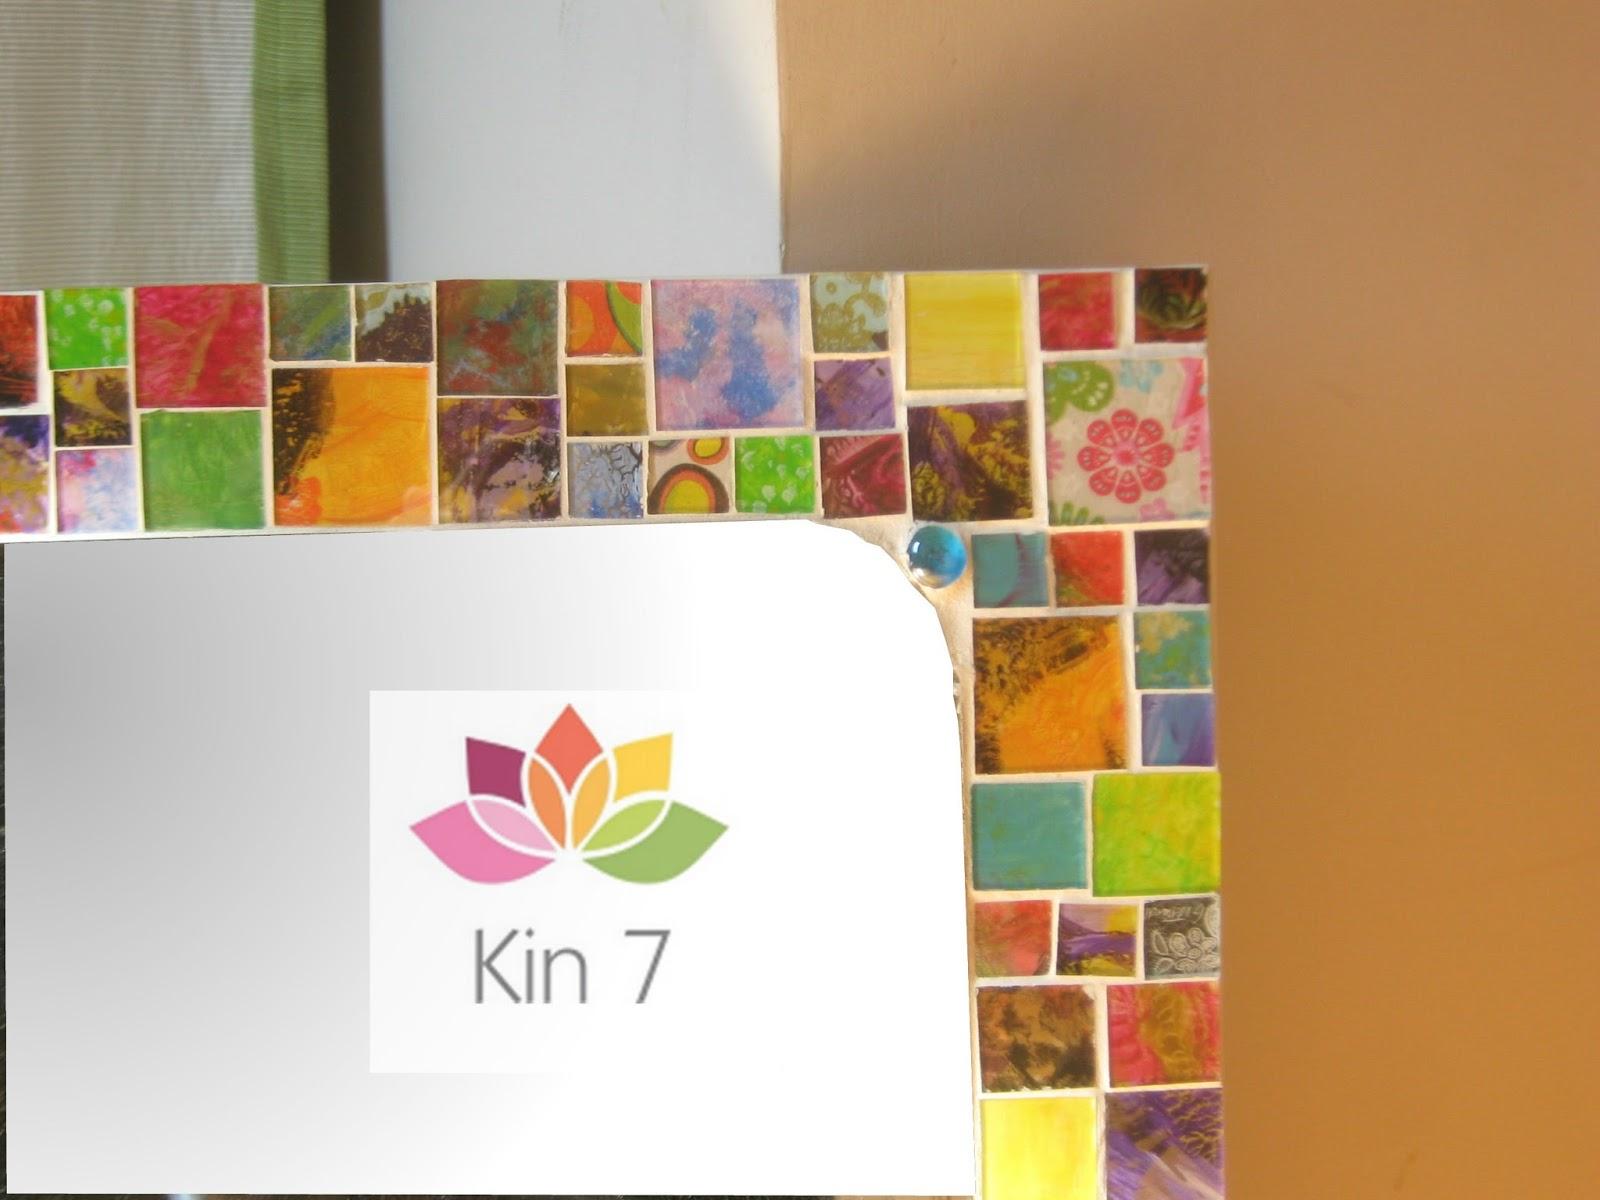 Kin 7 deco espejo con teselas artesanales for Espejos artesanales